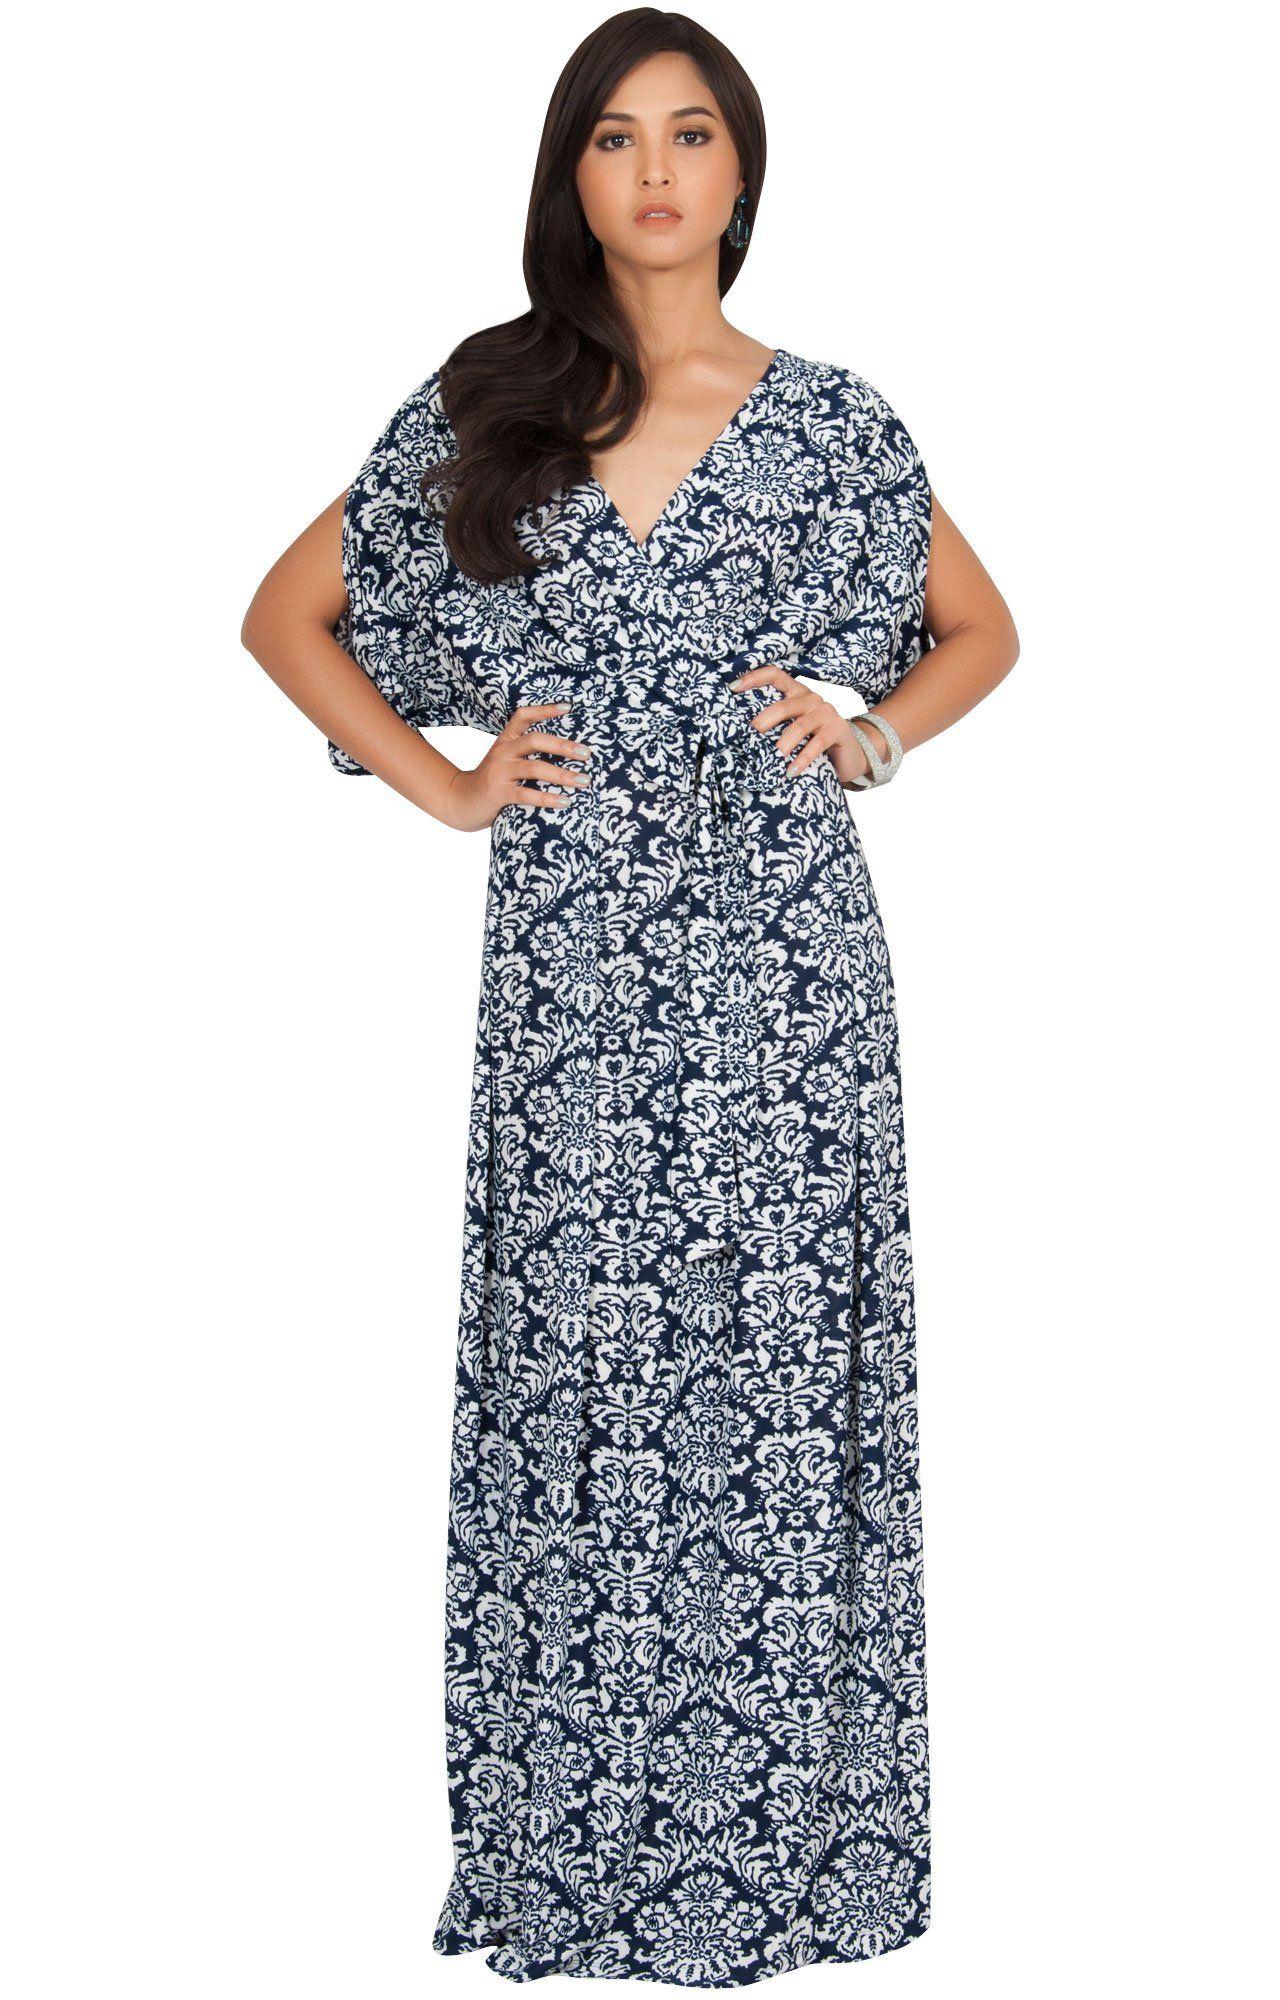 94e98a79f282c Women Maternity Clothes - KOH KOH Plus Size Womens Long VNeck Short Sleeve  Bohemian Print Flowy